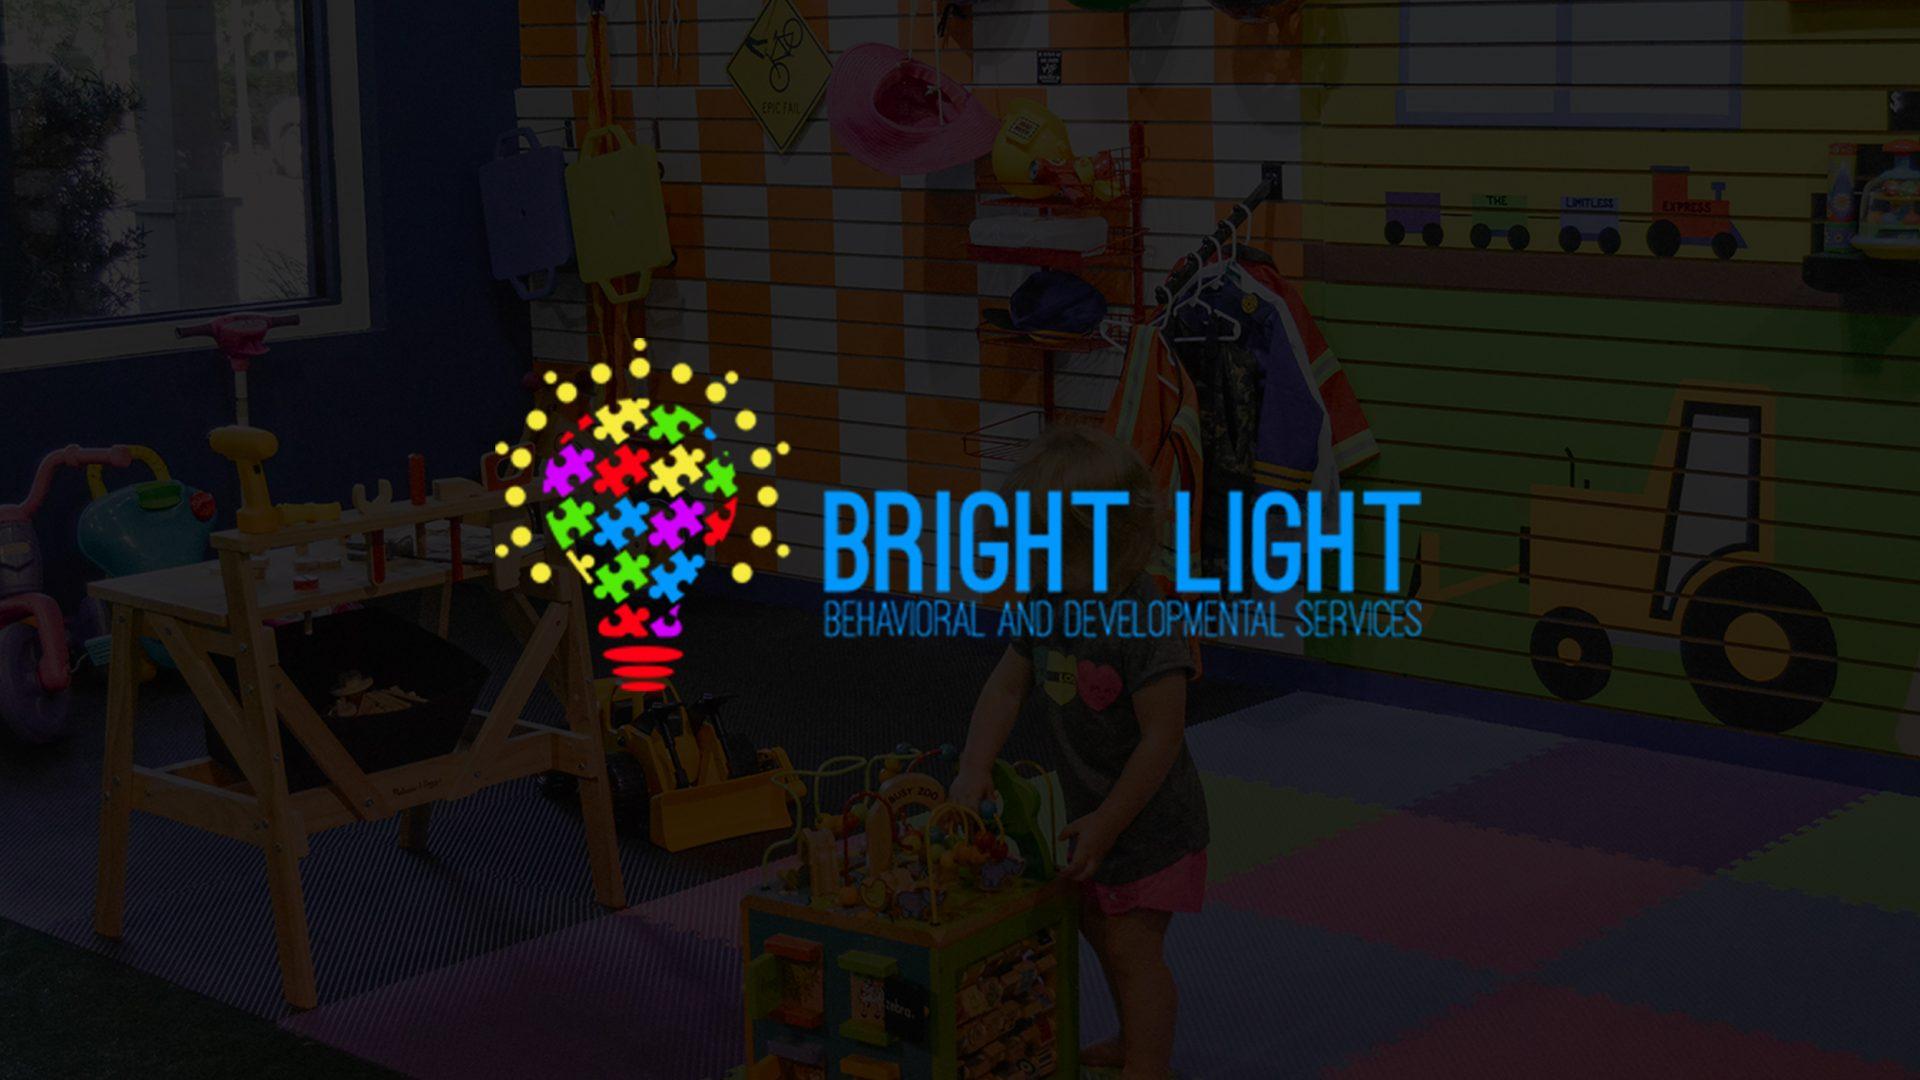 Bright Light Behavioral